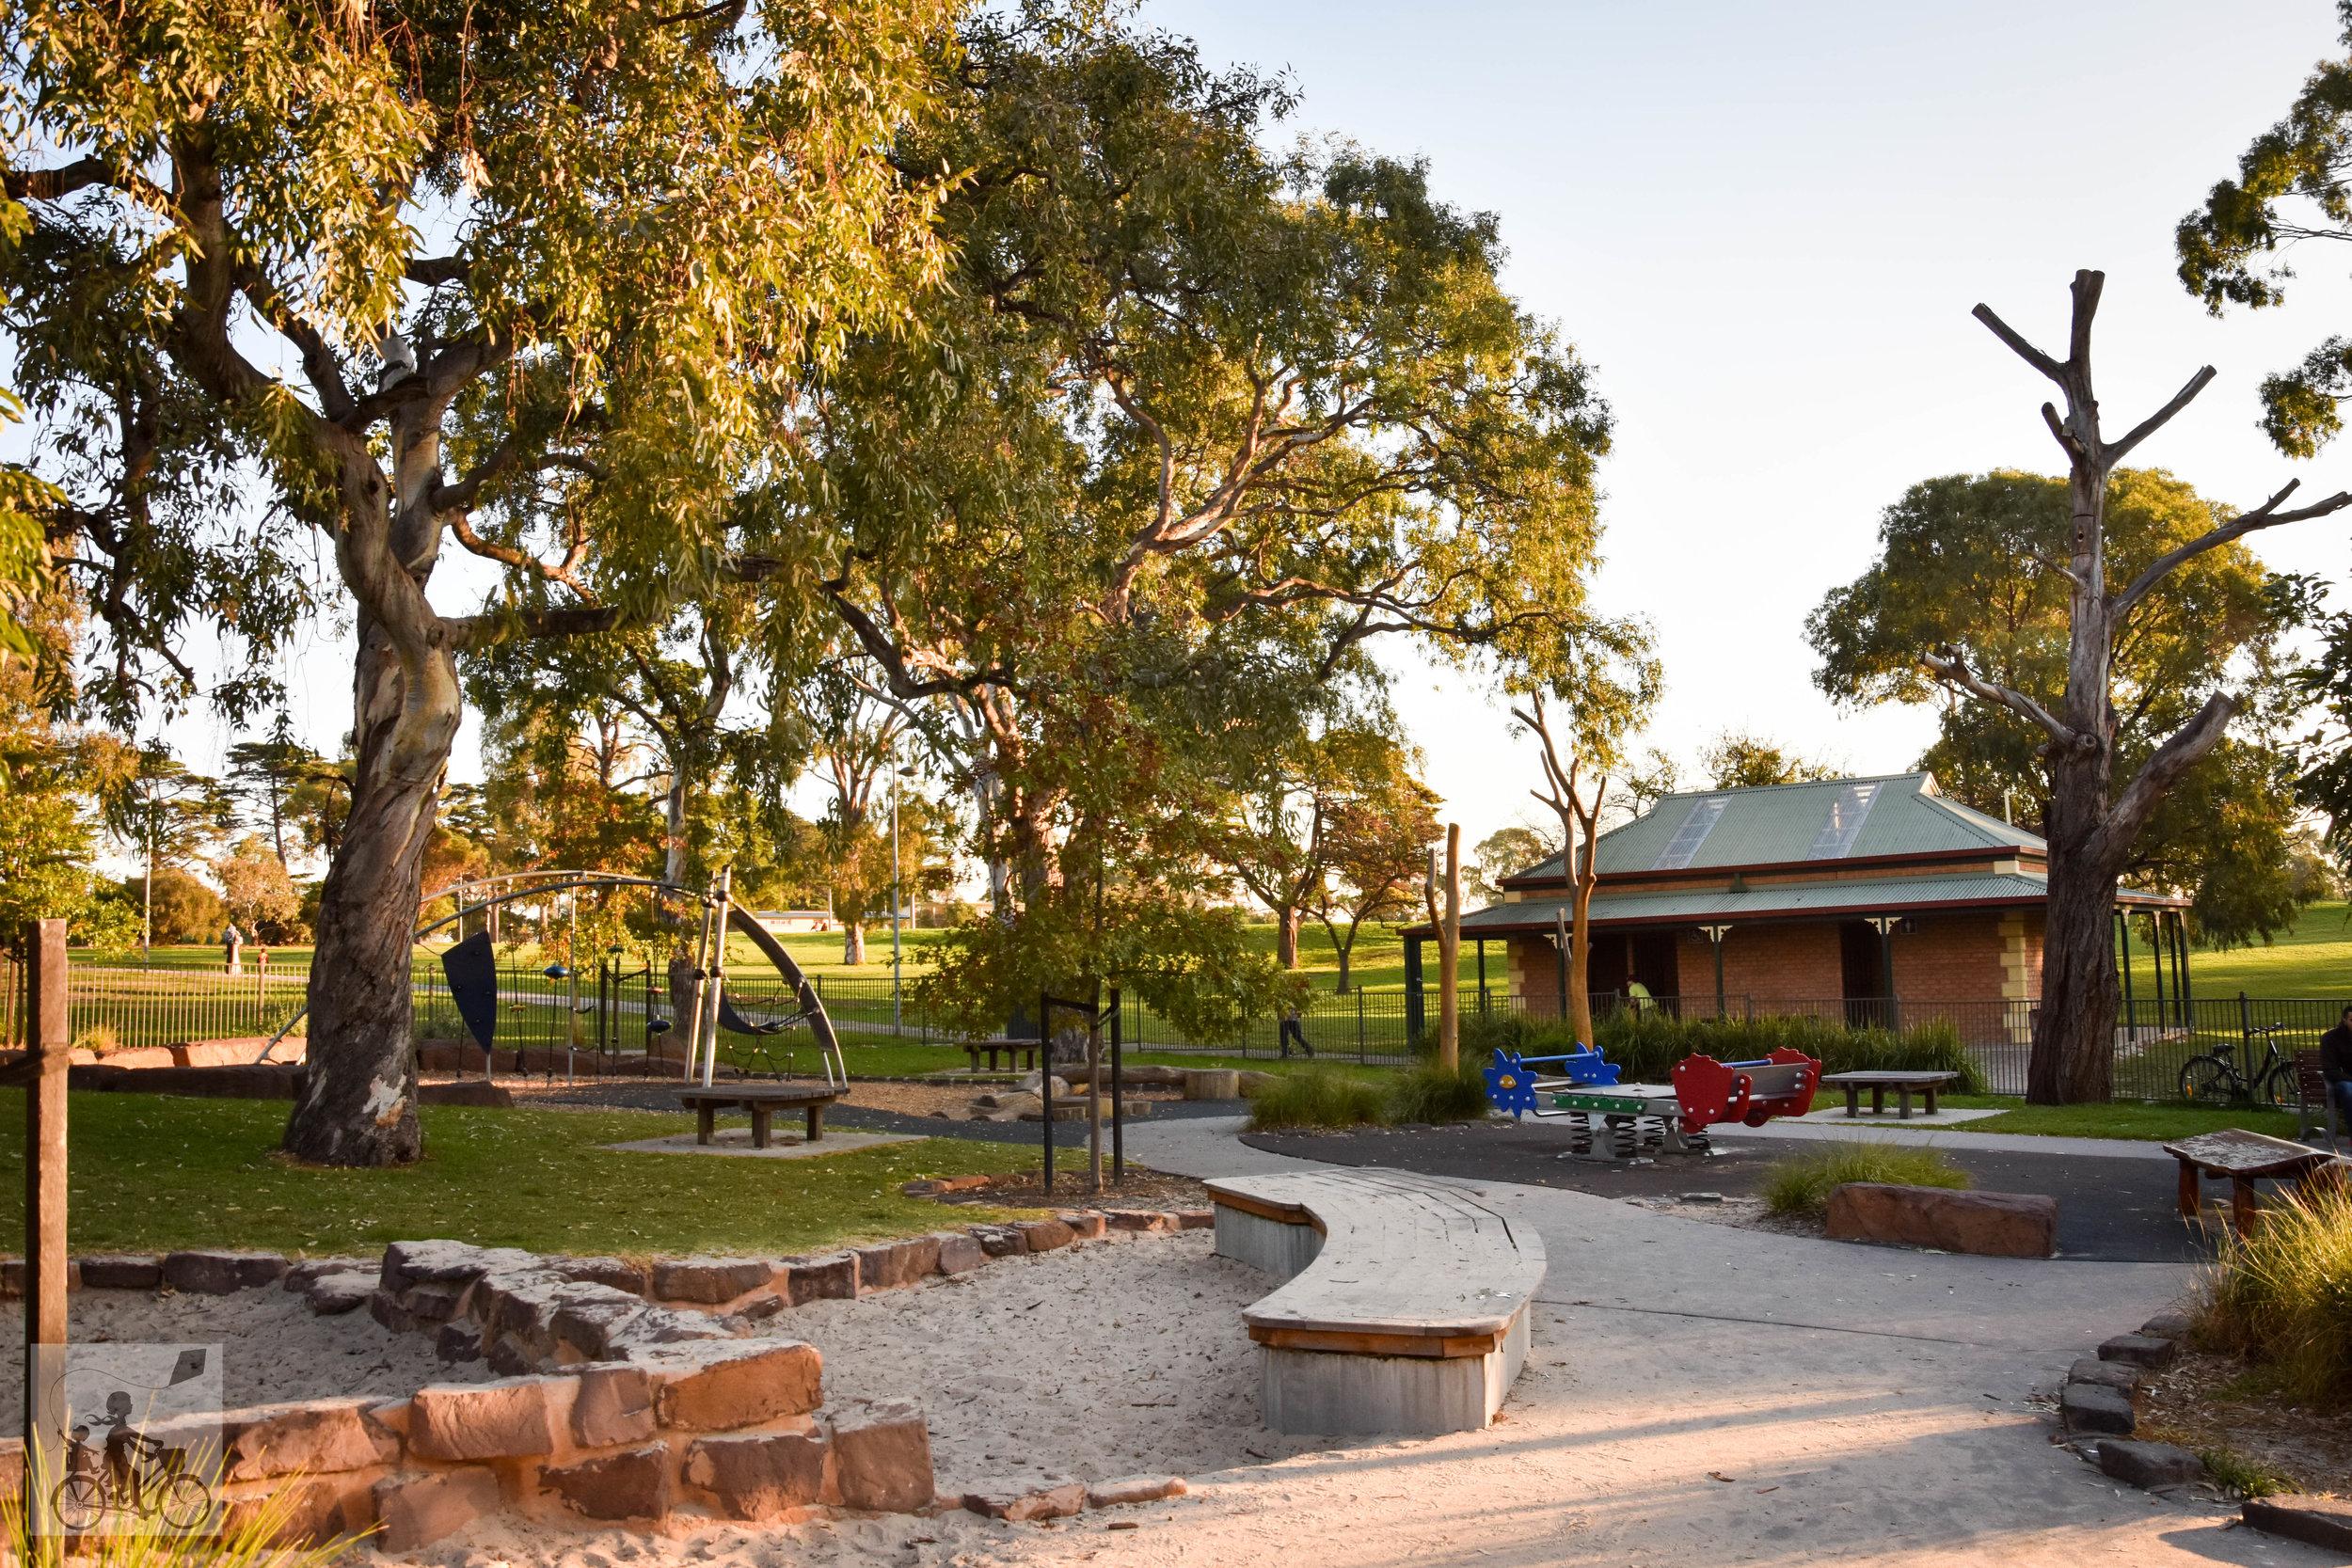 Mamma Knows North - Edwardes Lake Park